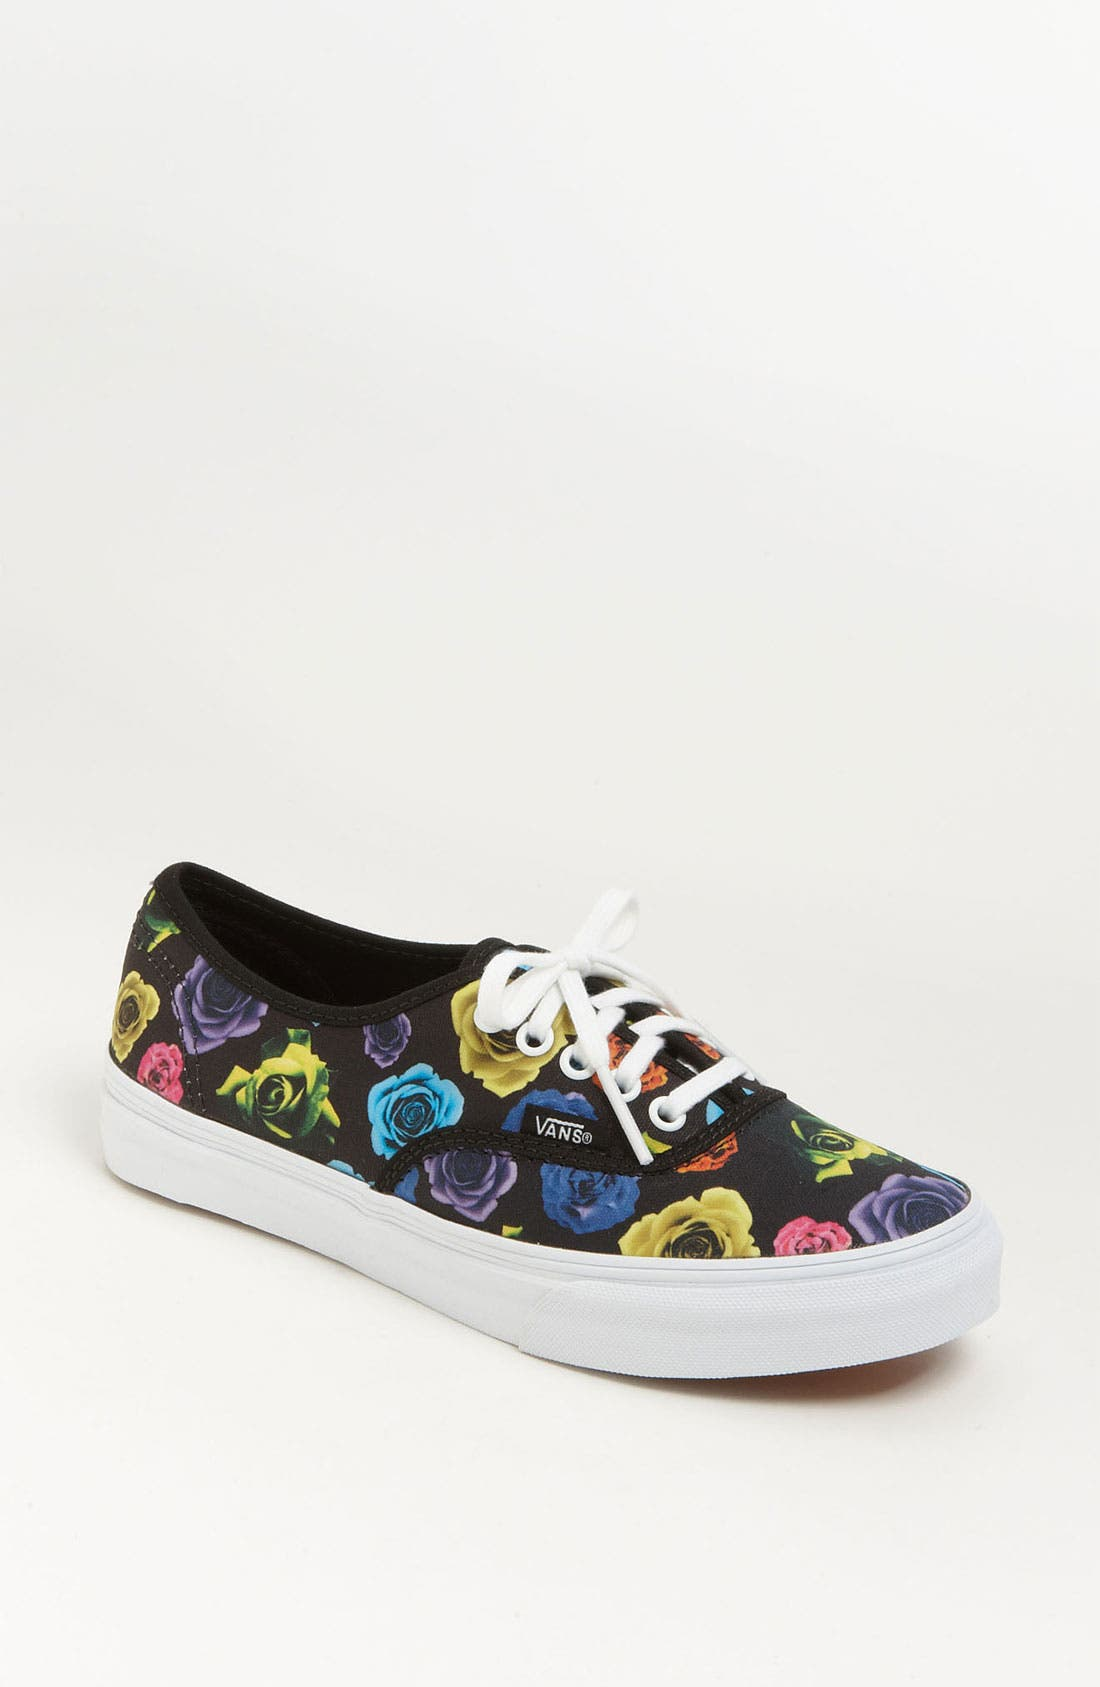 Alternate Image 1 Selected - Vans 'Authentic Slim - Rose' Sneaker (Women)